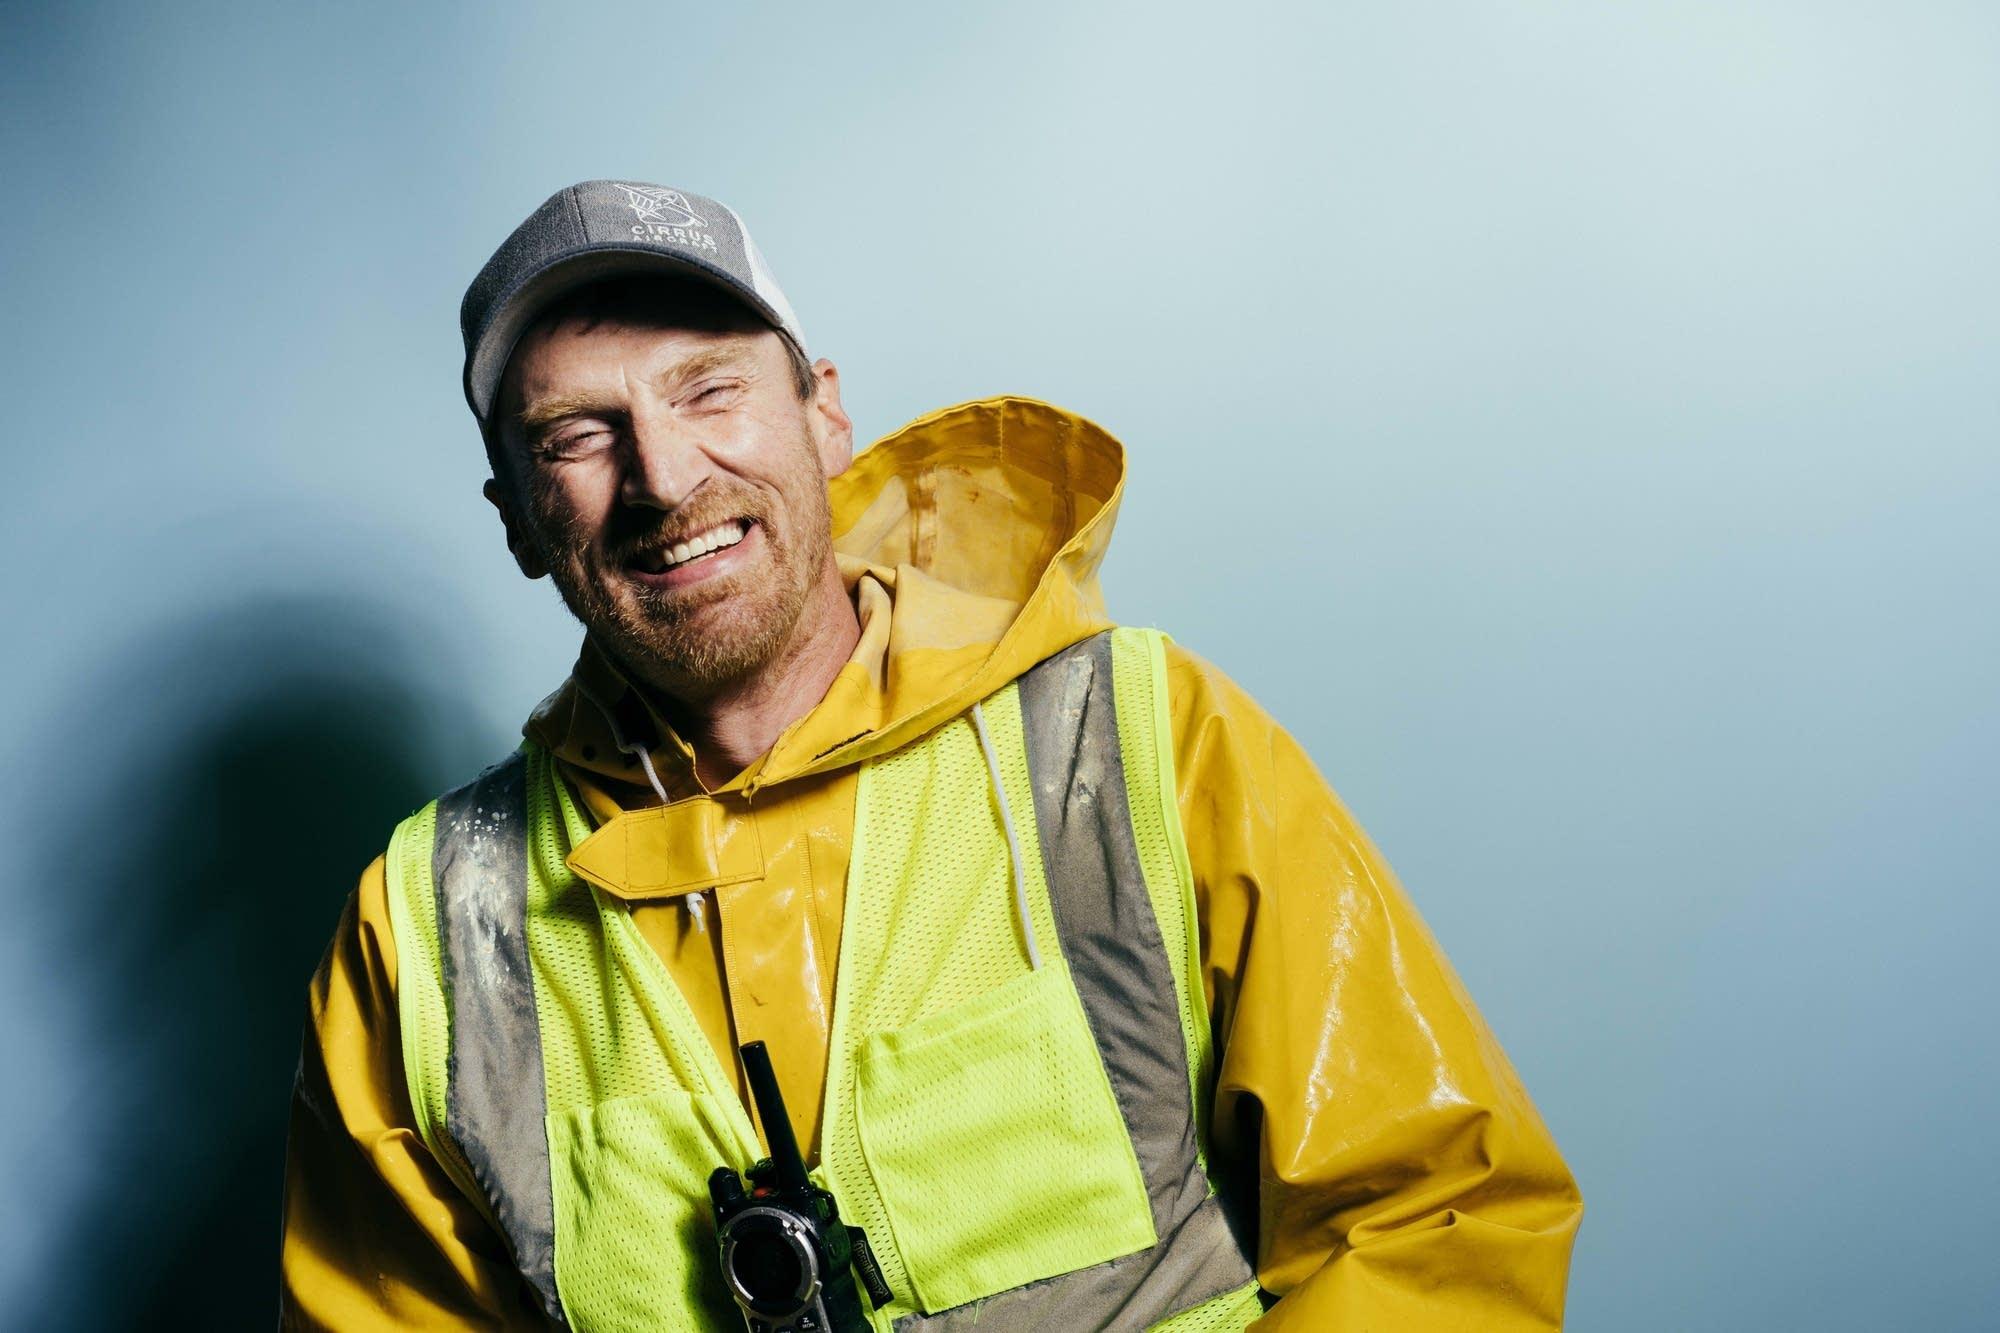 Lee Abramowski, of the Fond du Lac Band of Lake Superior Chippewa